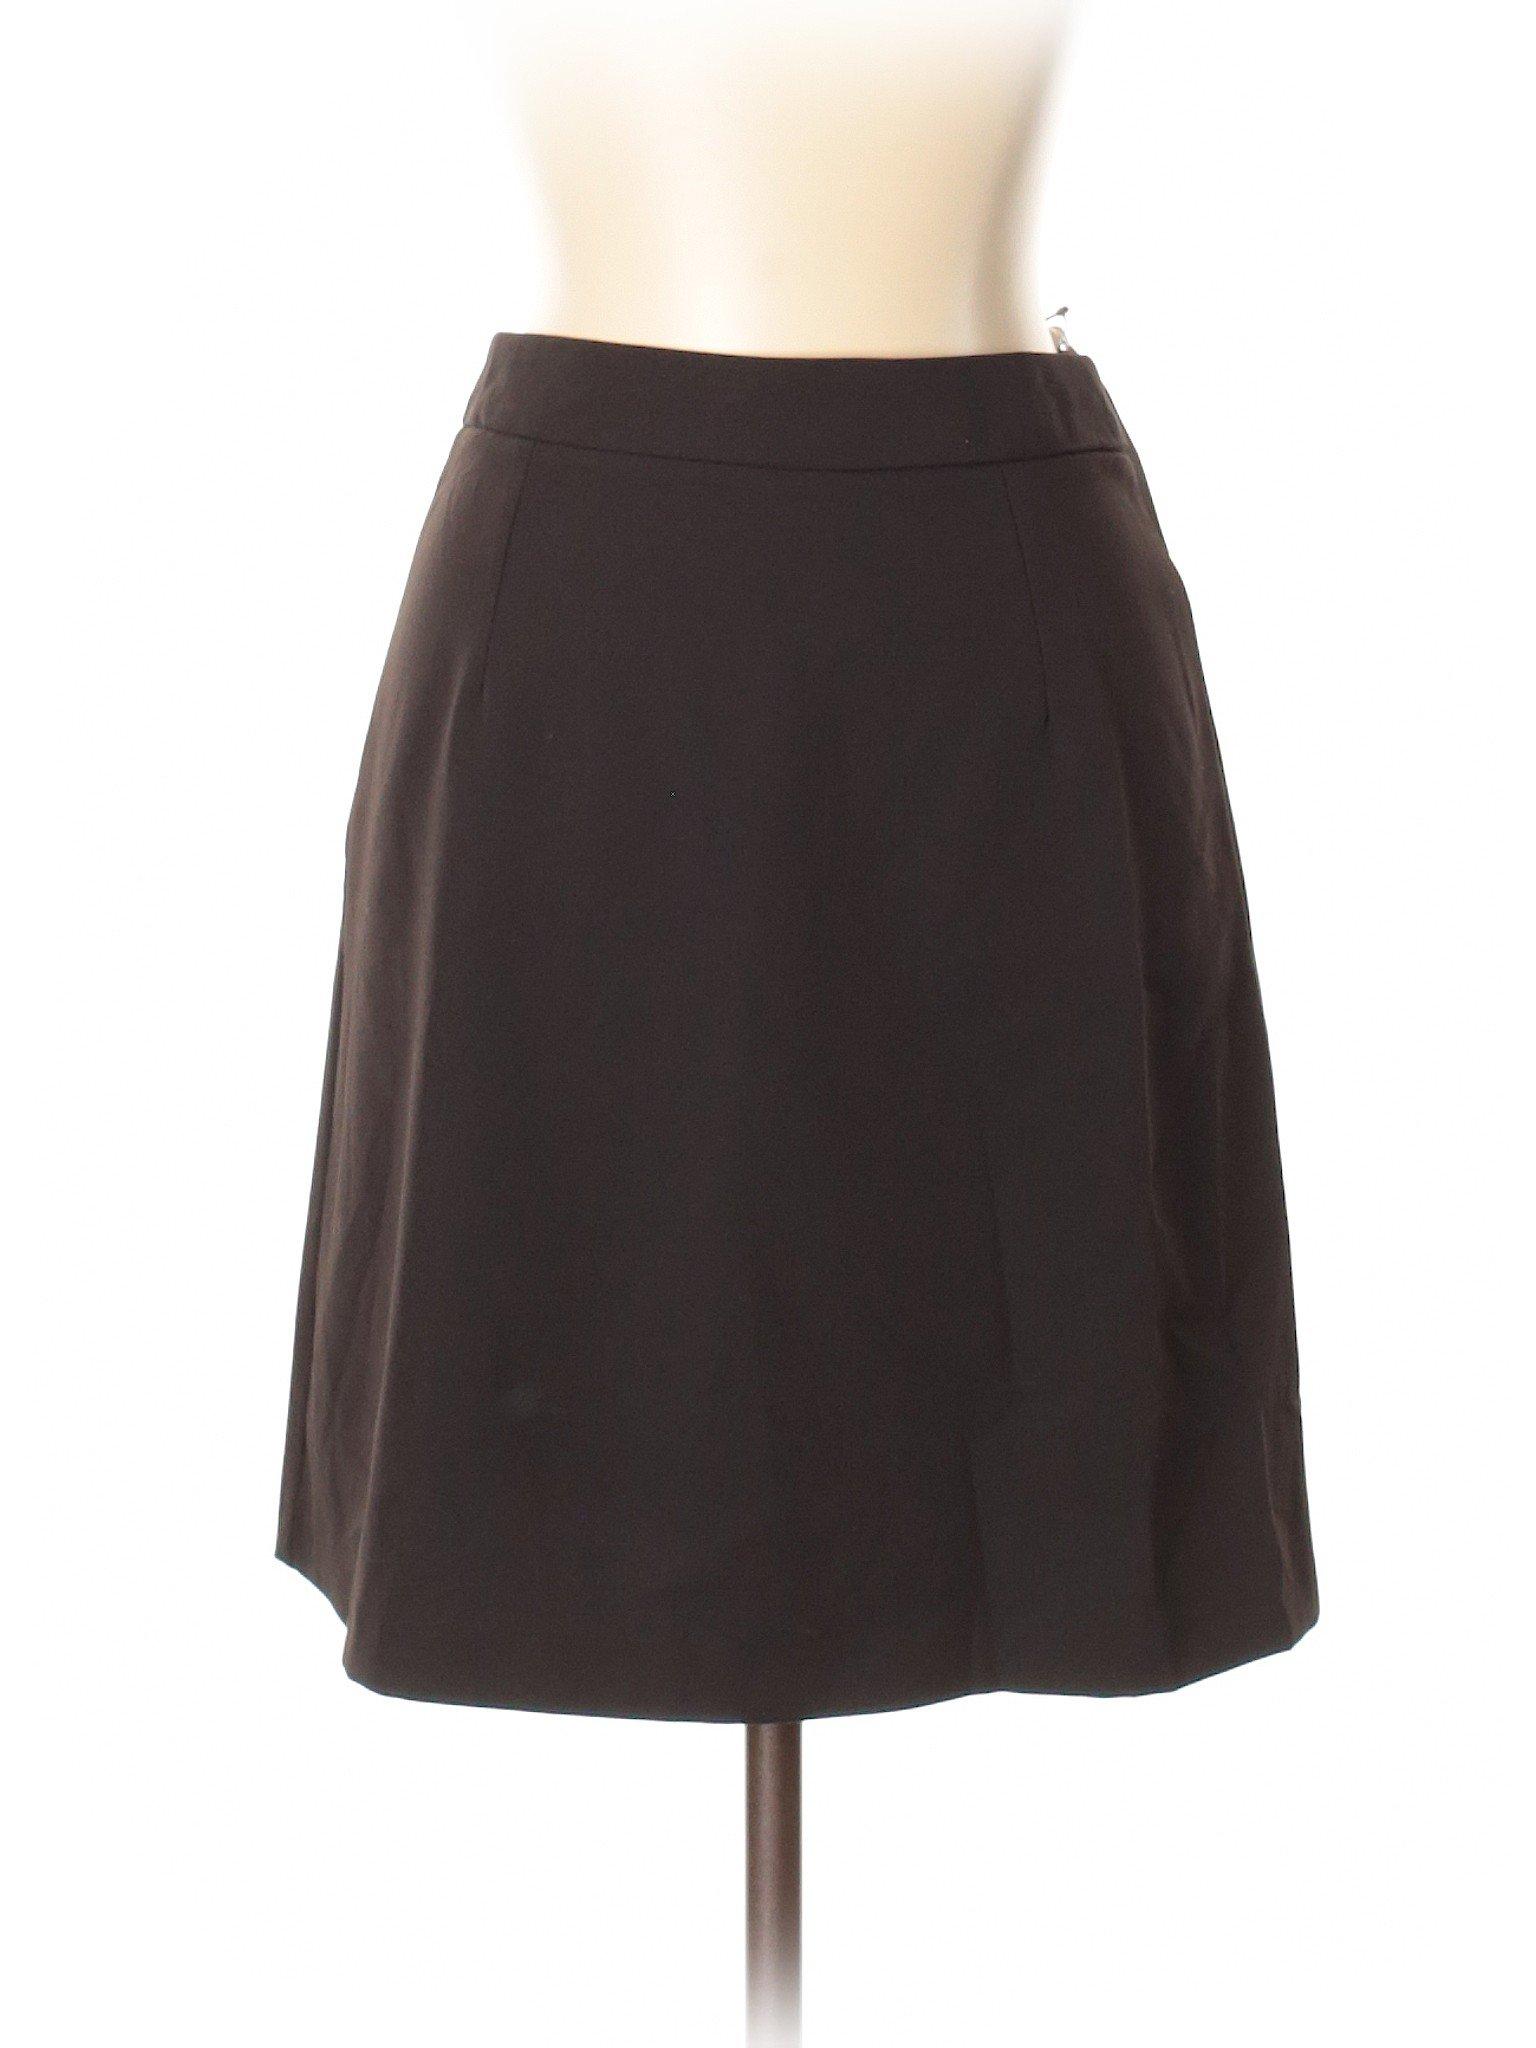 Boutique Casual Casual Skirt Boutique Skirt Boutique Casual Skirt AZqAzRx6